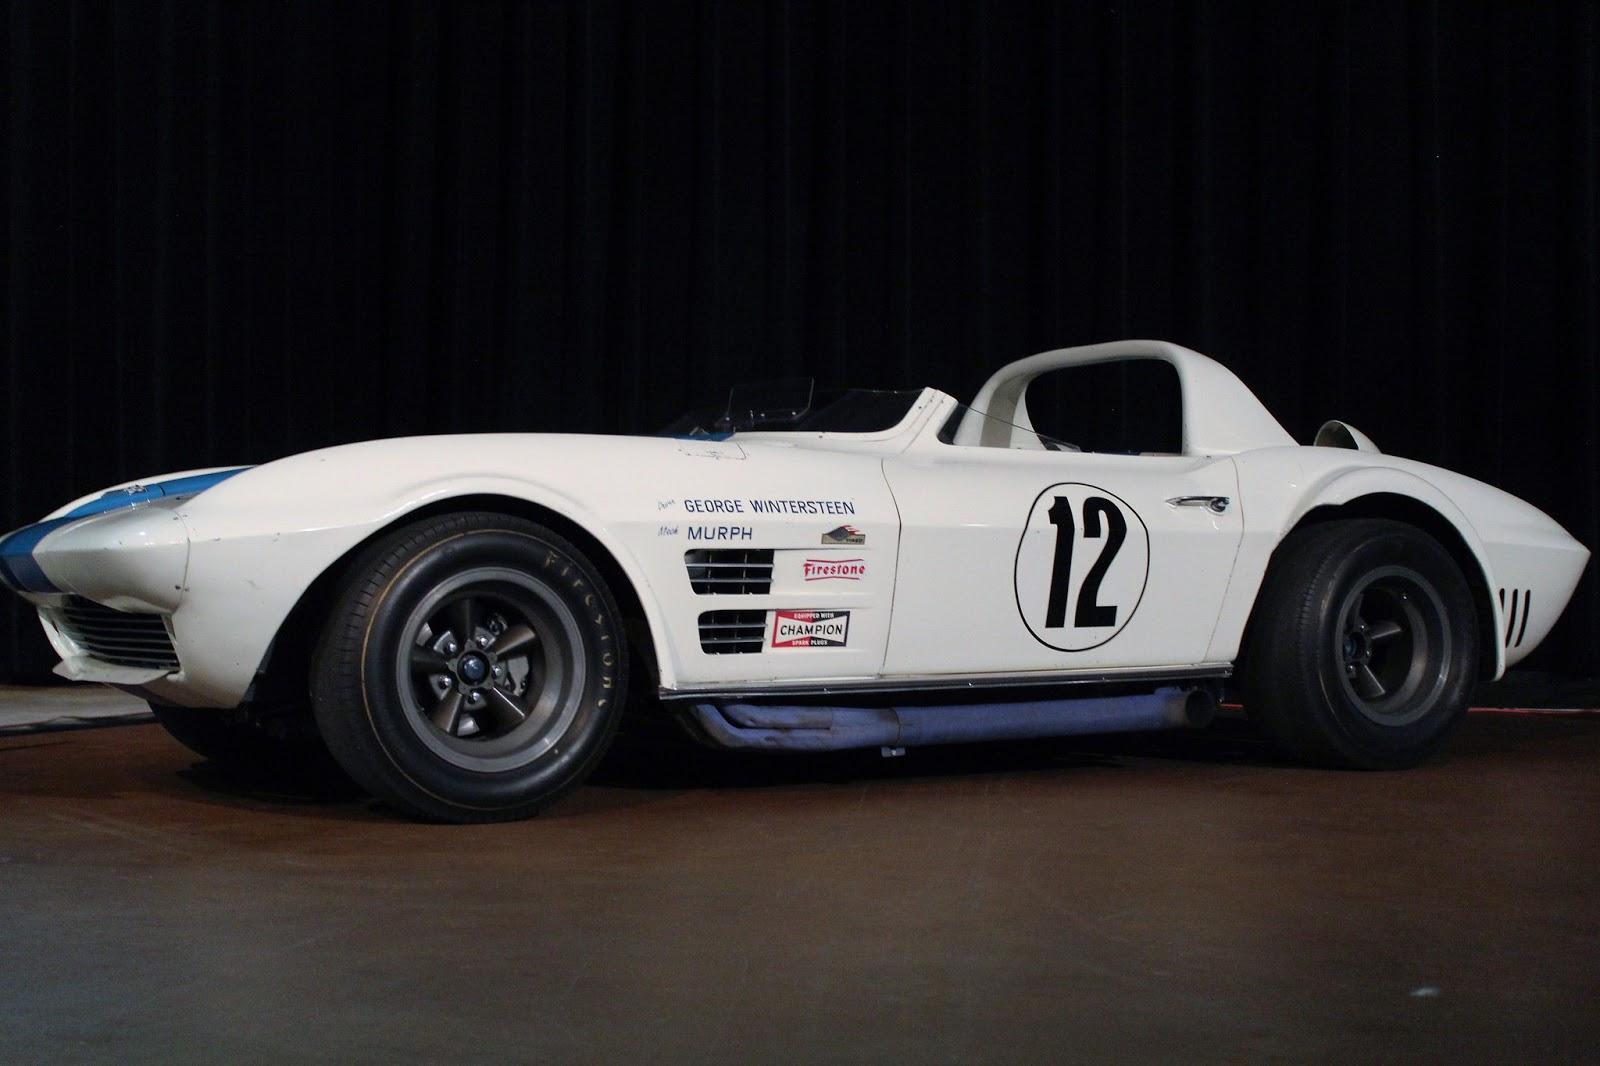 Cross-Country Corvette: Corvette Racing Weekend, Simeone Museum